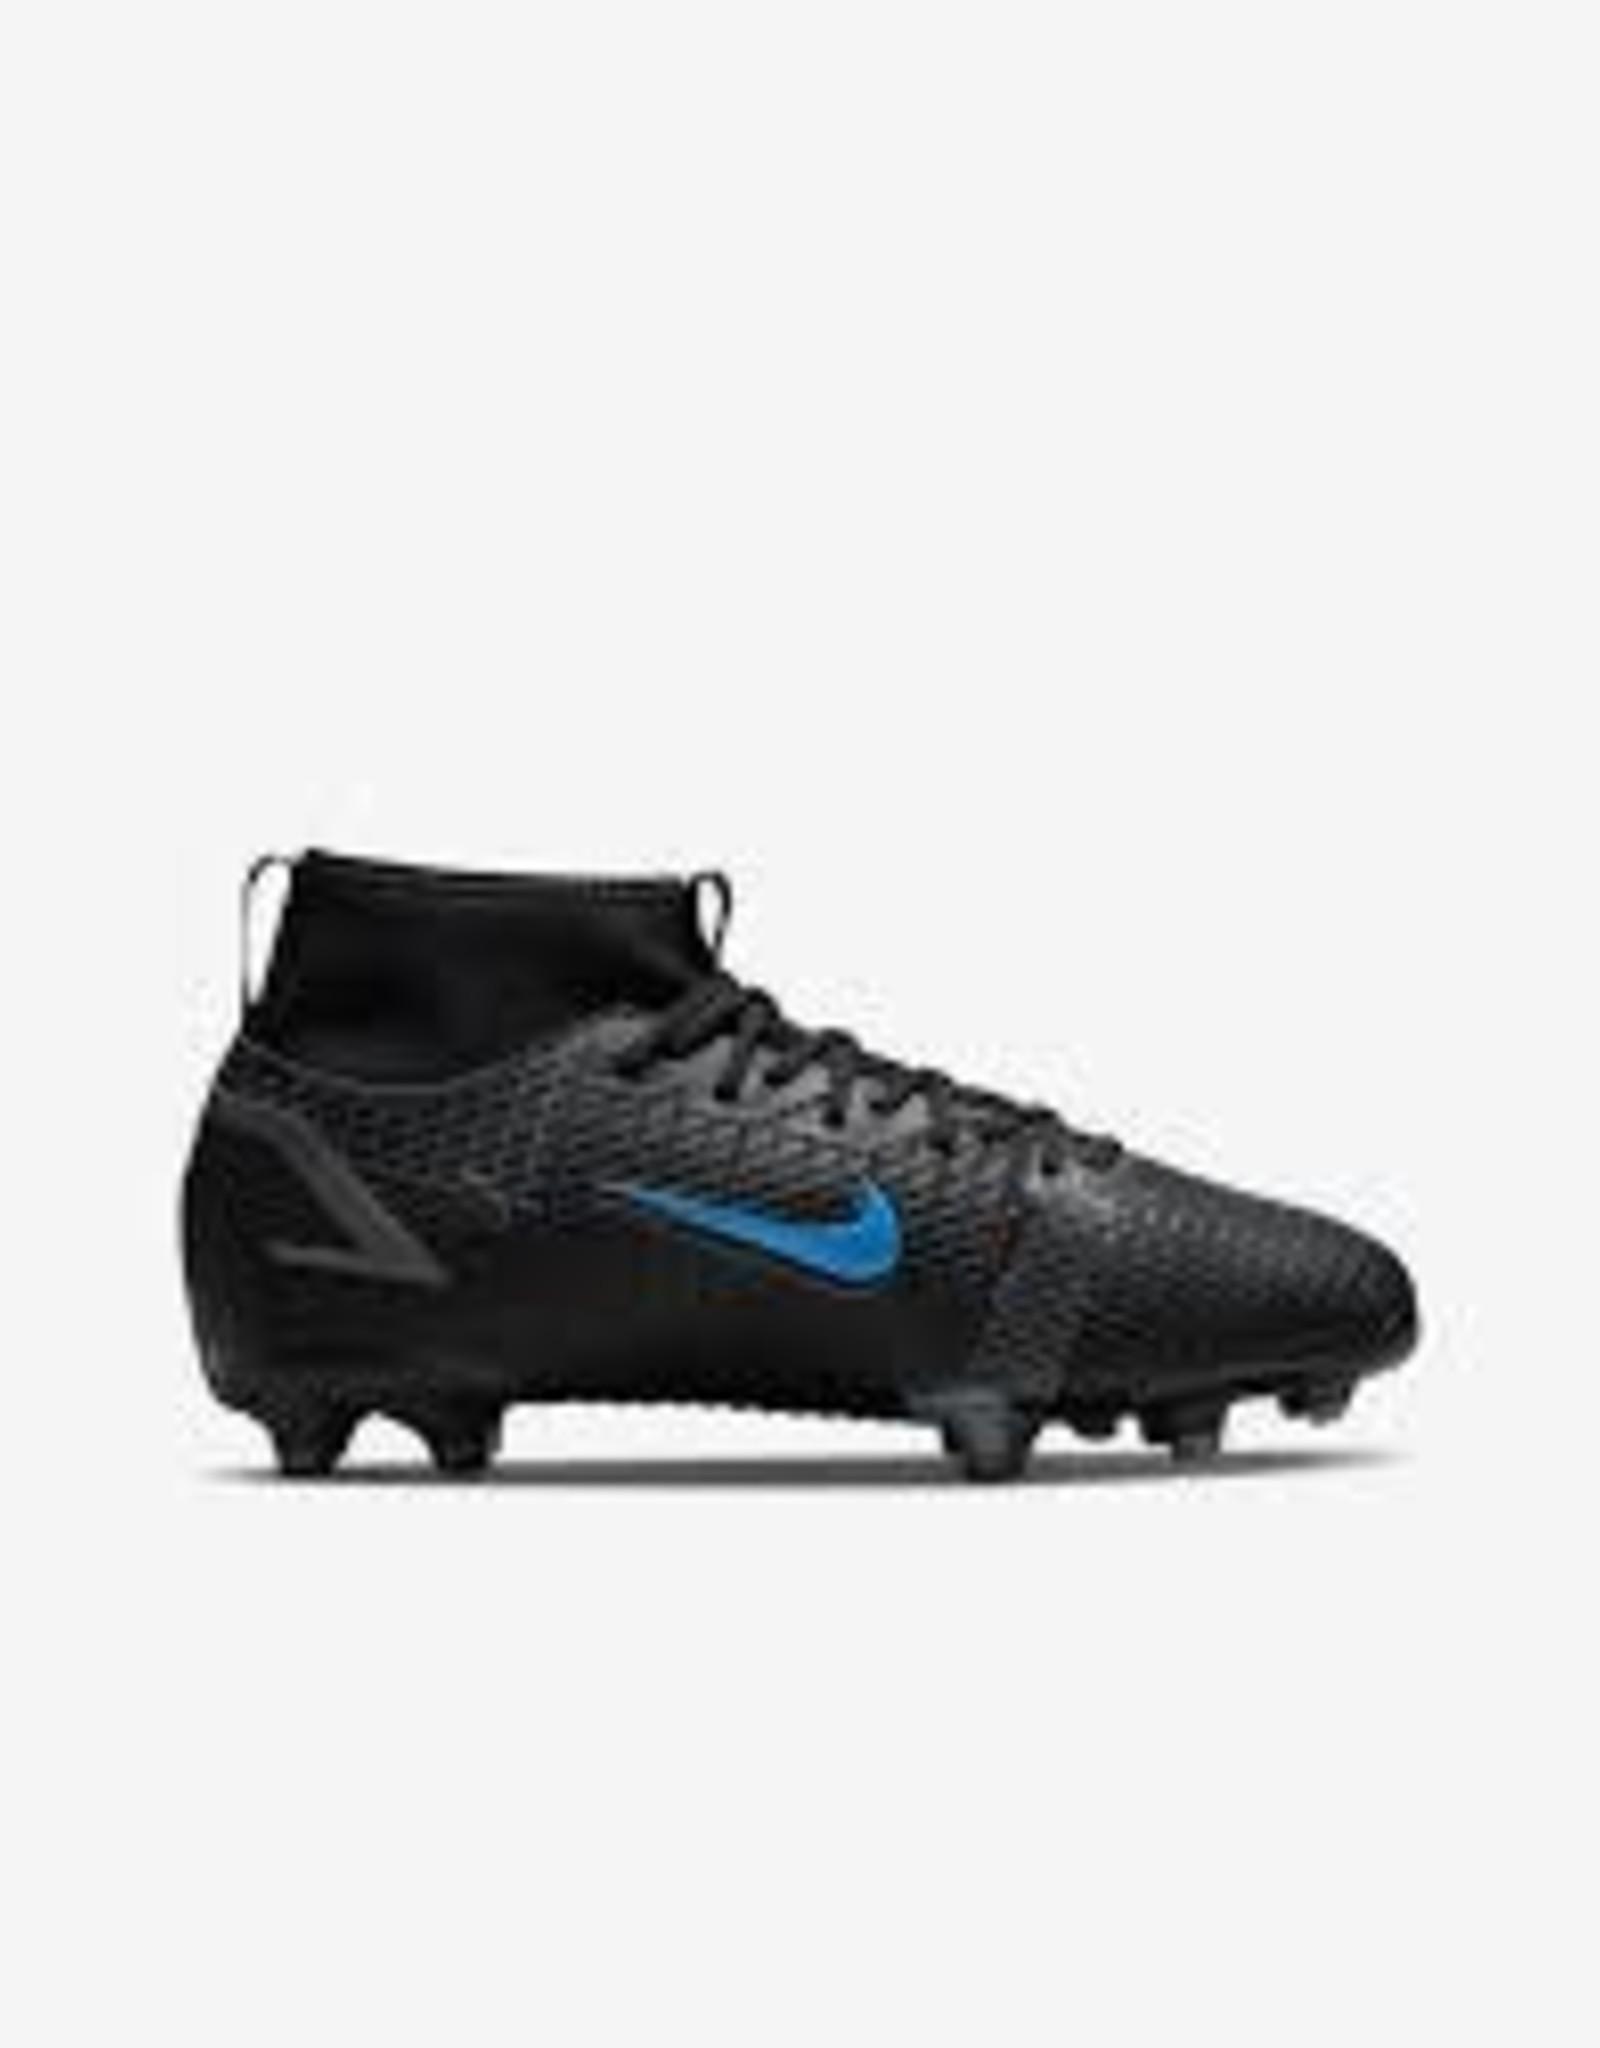 Nike Nike Superfly 8 academy fg/mg jr